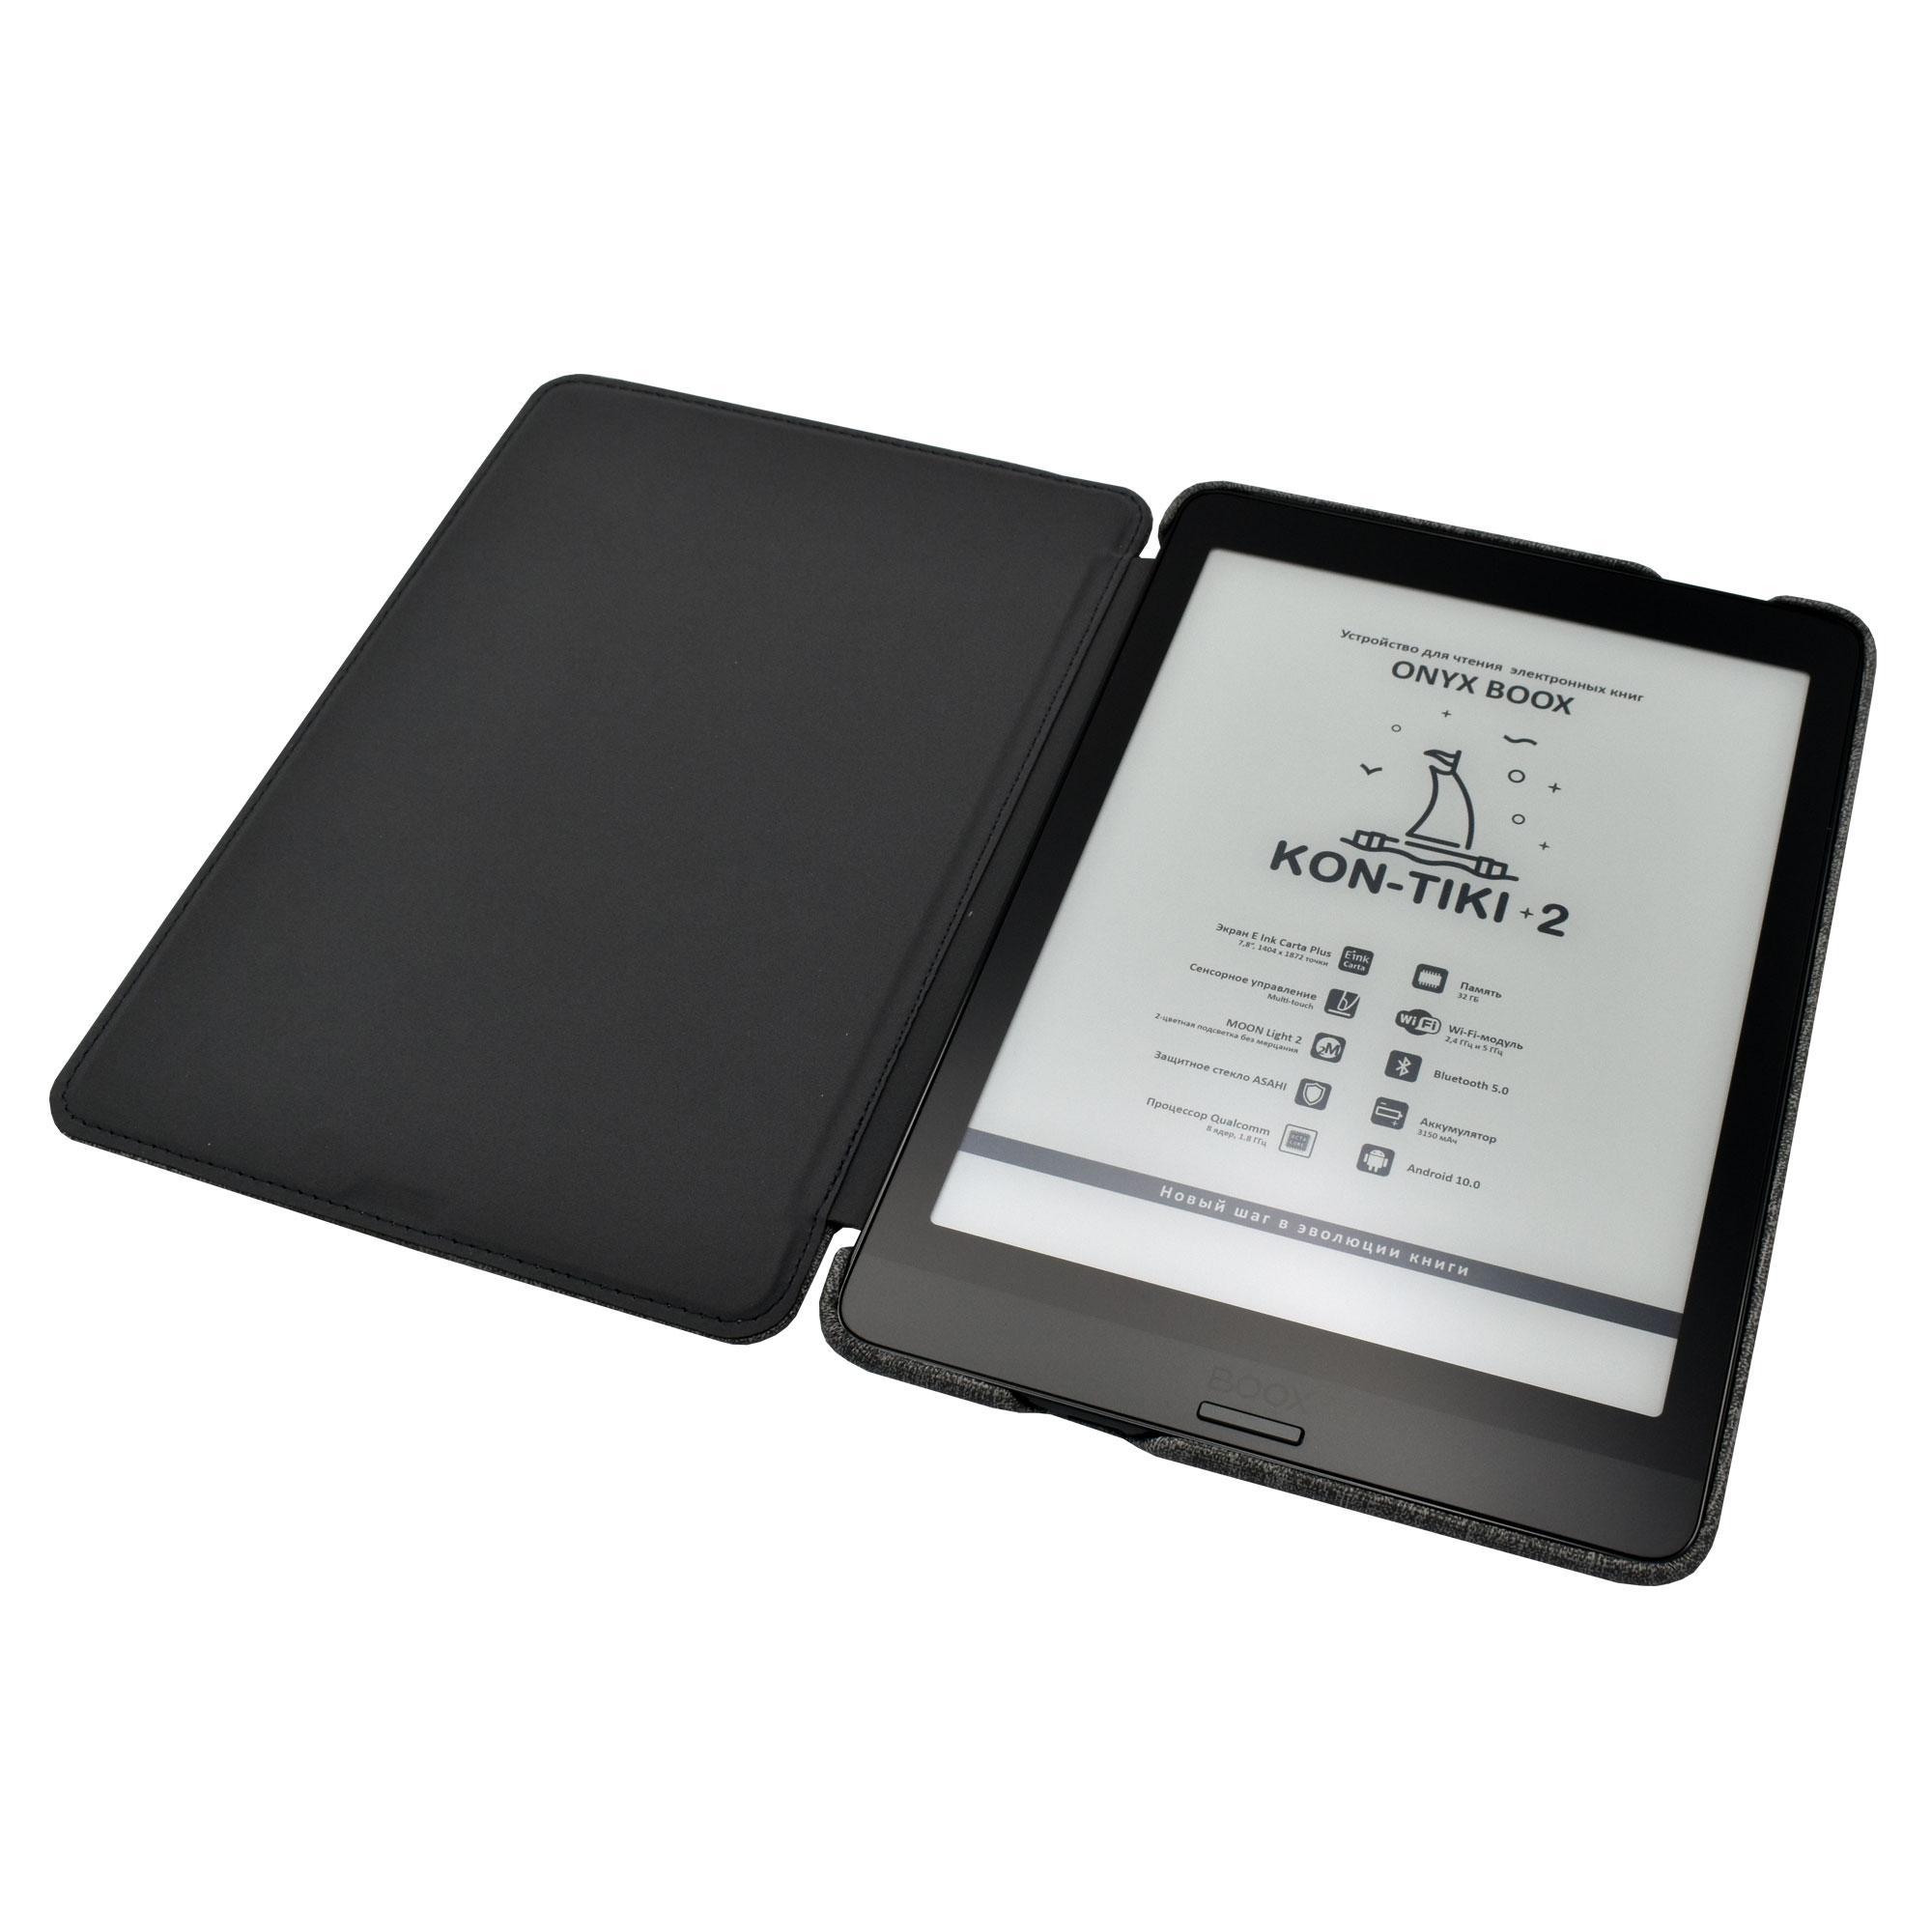 ONYX BOOX выпустила обновлённую электронную книгу Kon-Tiki 2